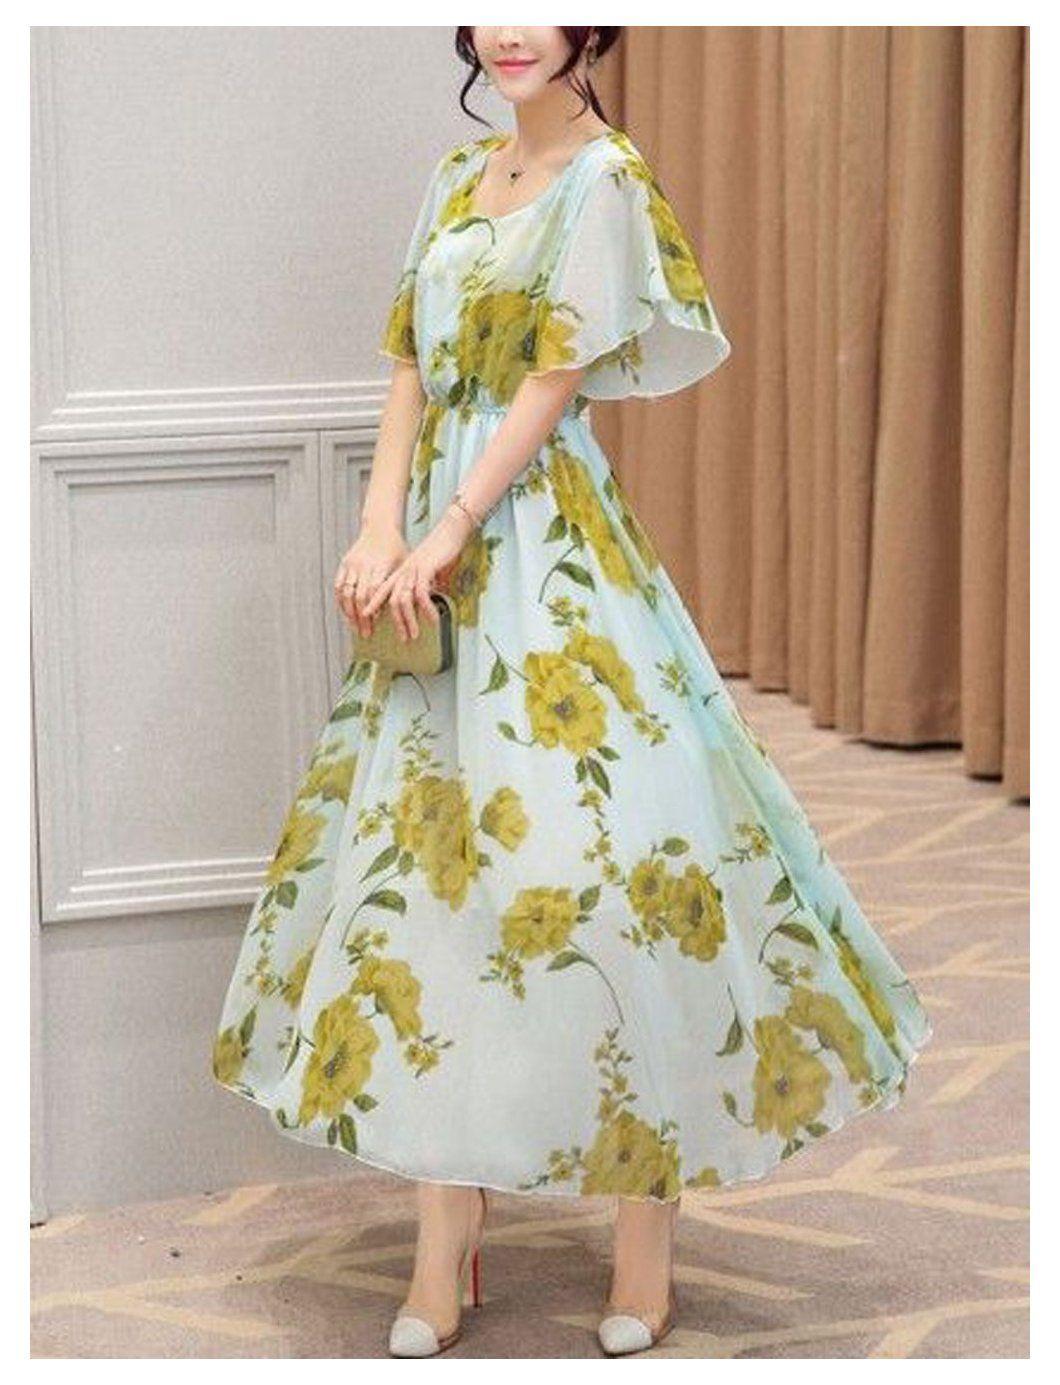 Summer Chiffon Floral Print Maxi Dress Women S Fashion Maxidress Floral Women Dresses Floralc Floral Chiffon Maxi Dress Maxi Dress Maxi Dress With Sleeves [ 1385 x 1060 Pixel ]